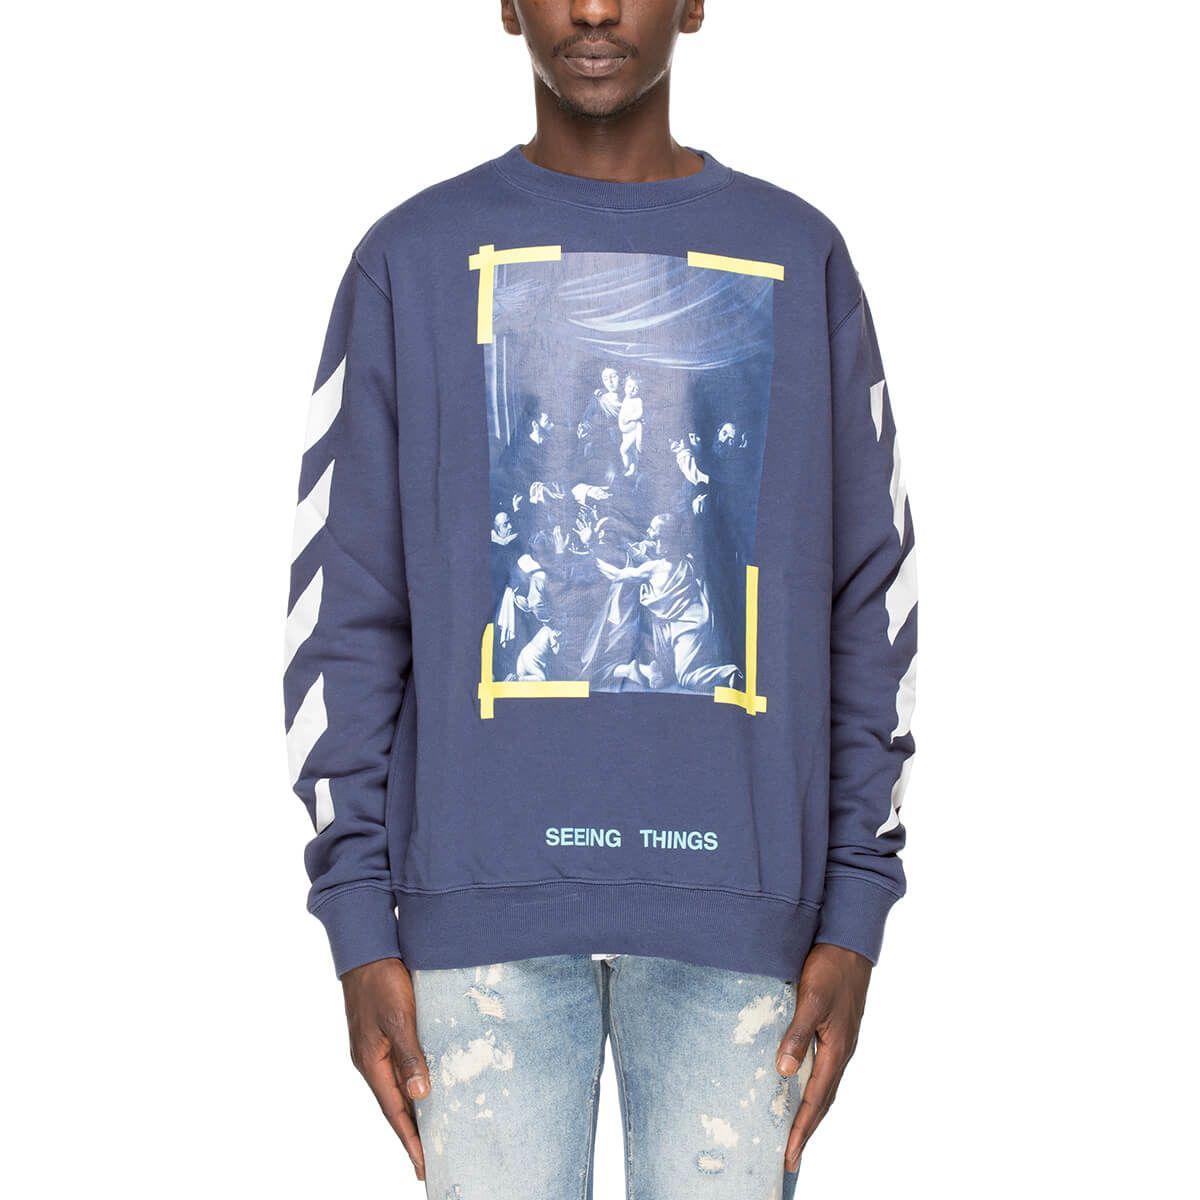 68a3431f9 Off-White Caravaggio Sweatshirt In Blue | ModeSens